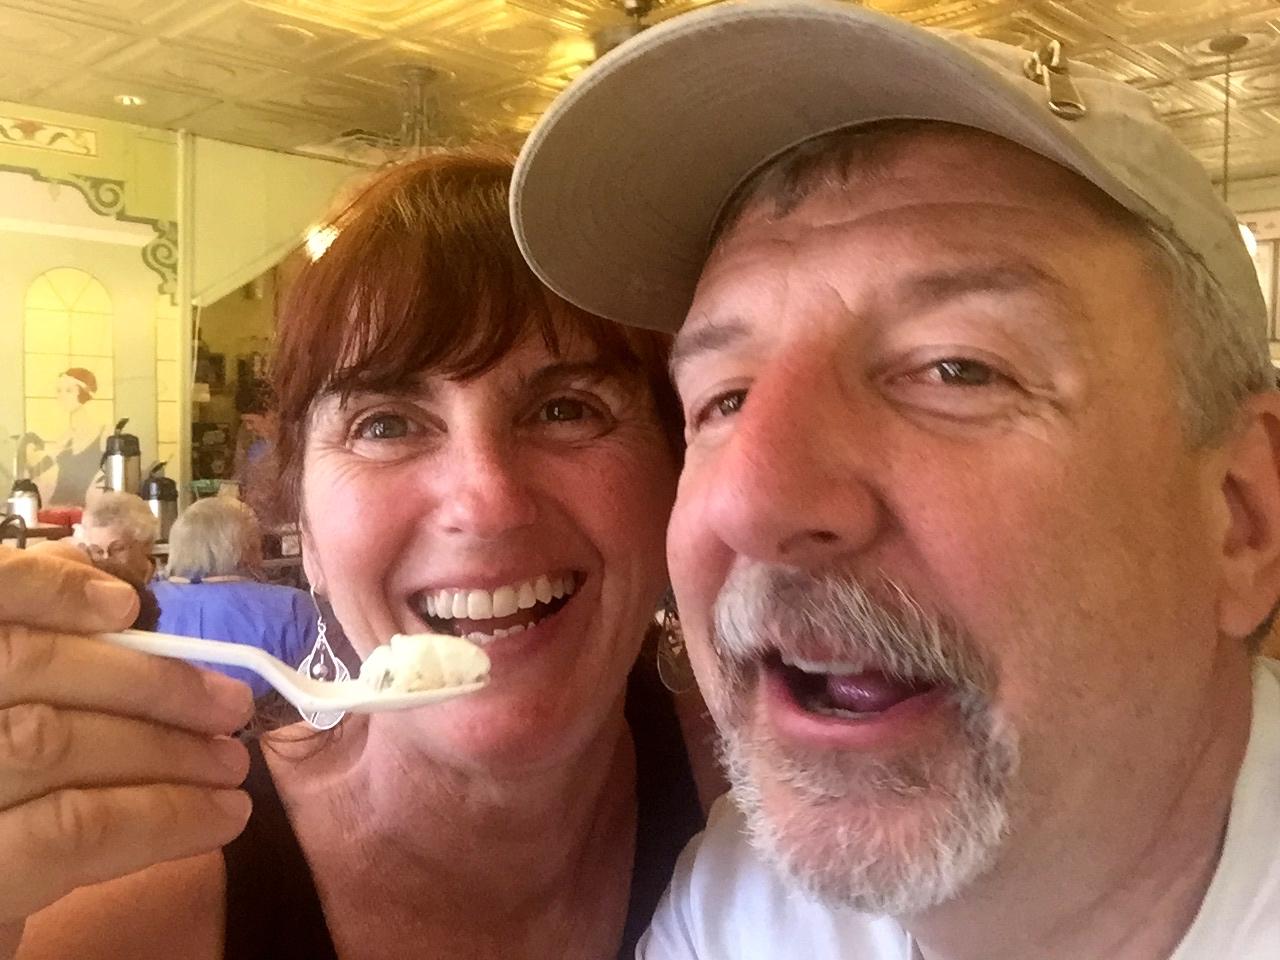 The Homemade Ice-Cream Got Us